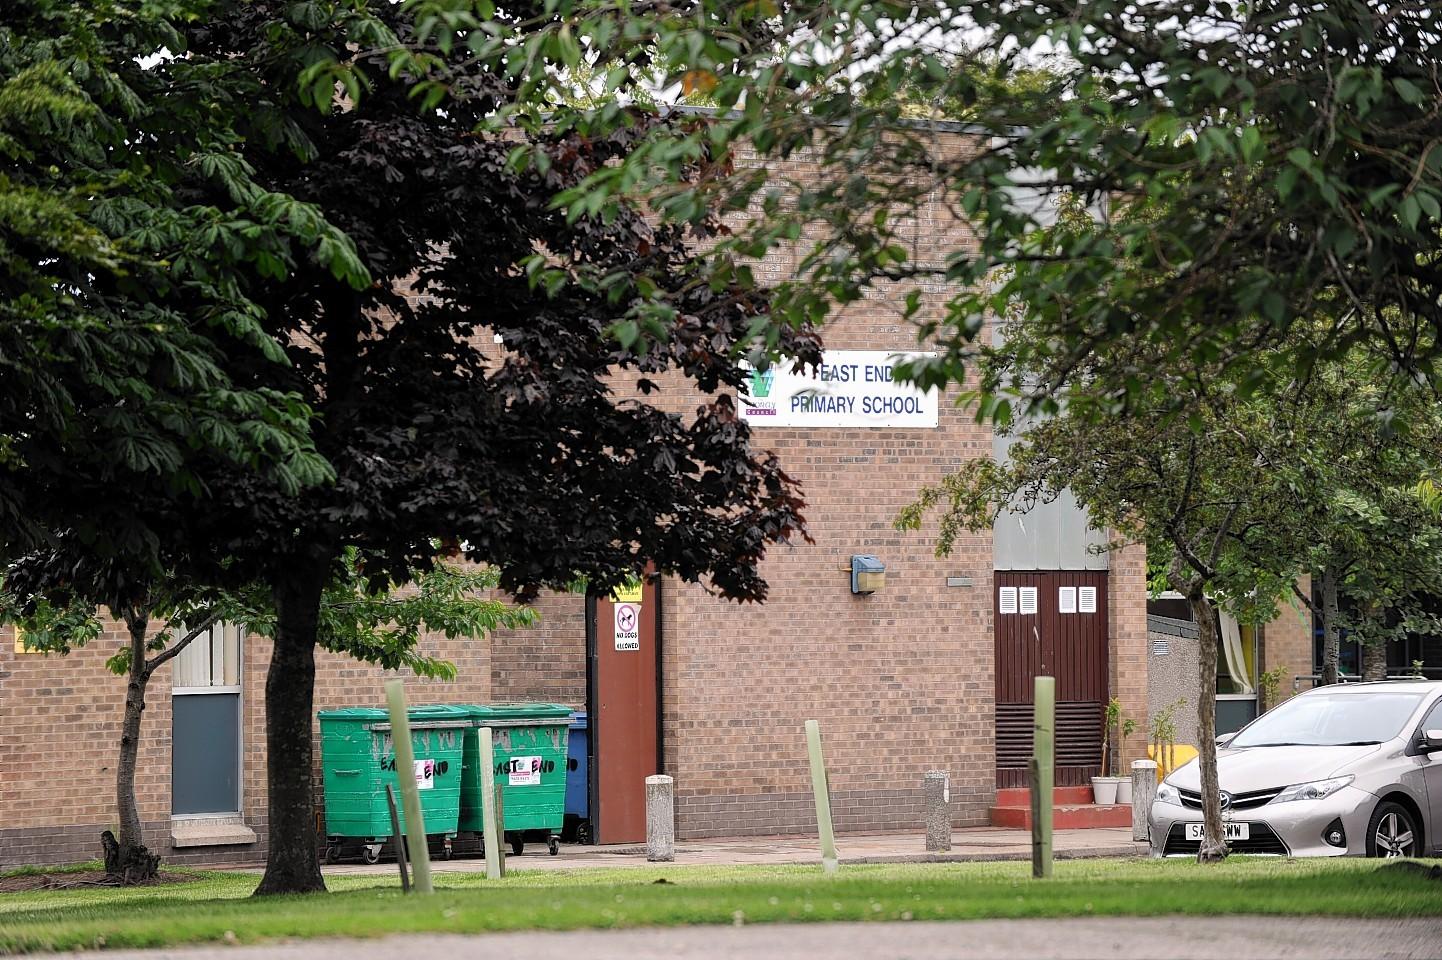 East End Primary School.